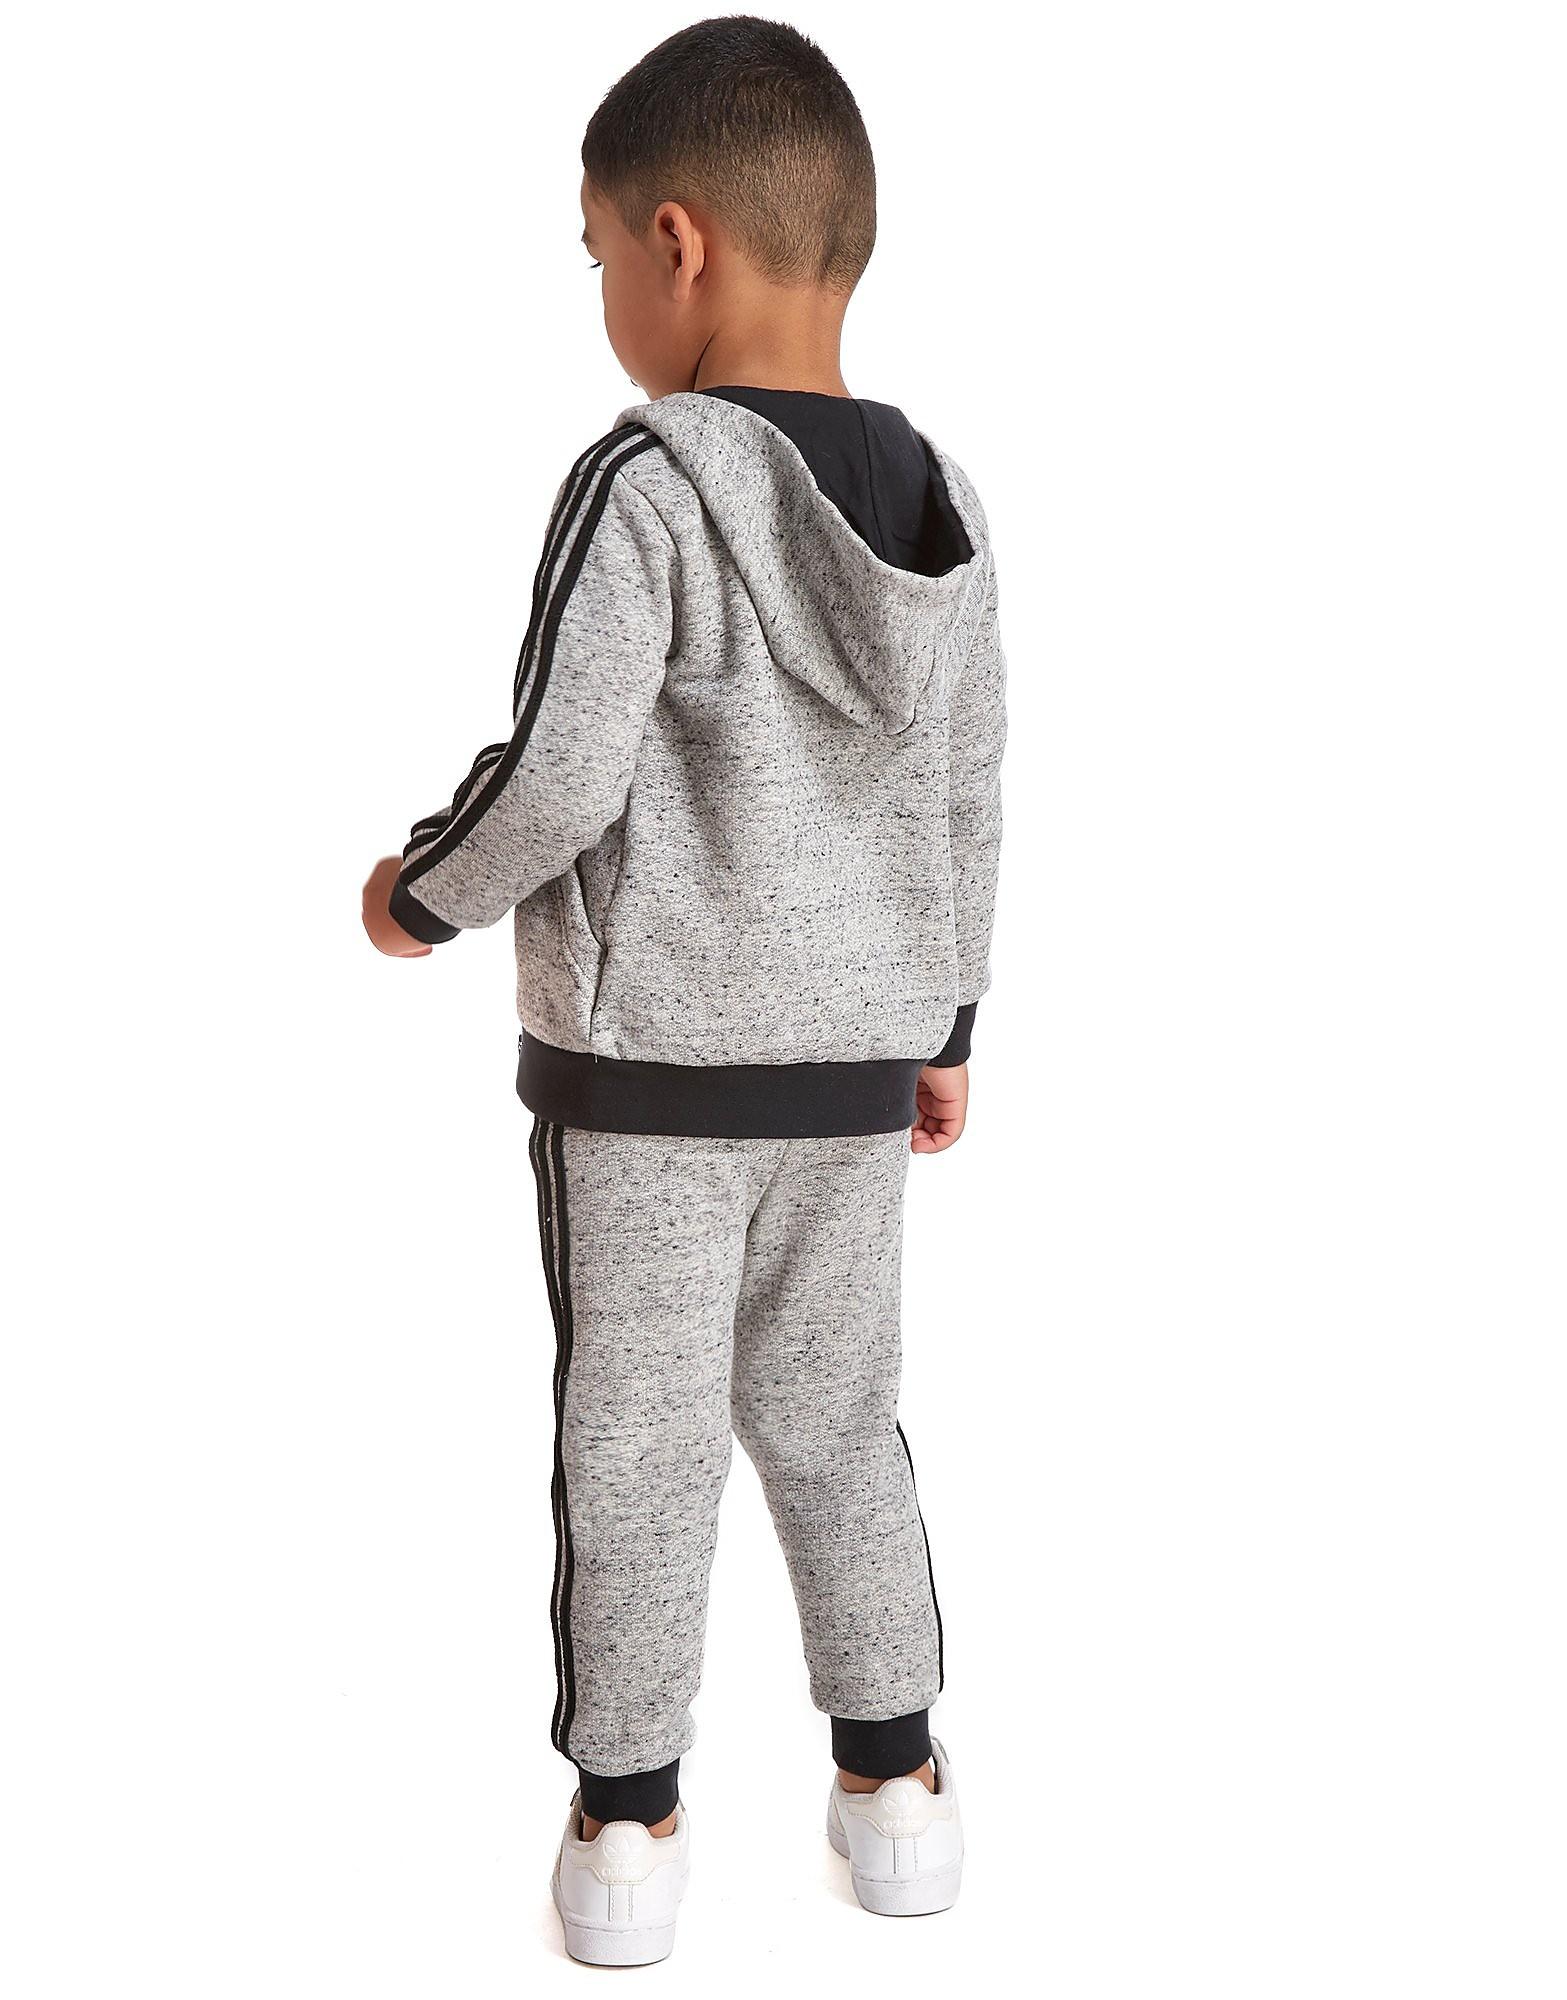 adidas Originals Trefoil Series Suit Infant